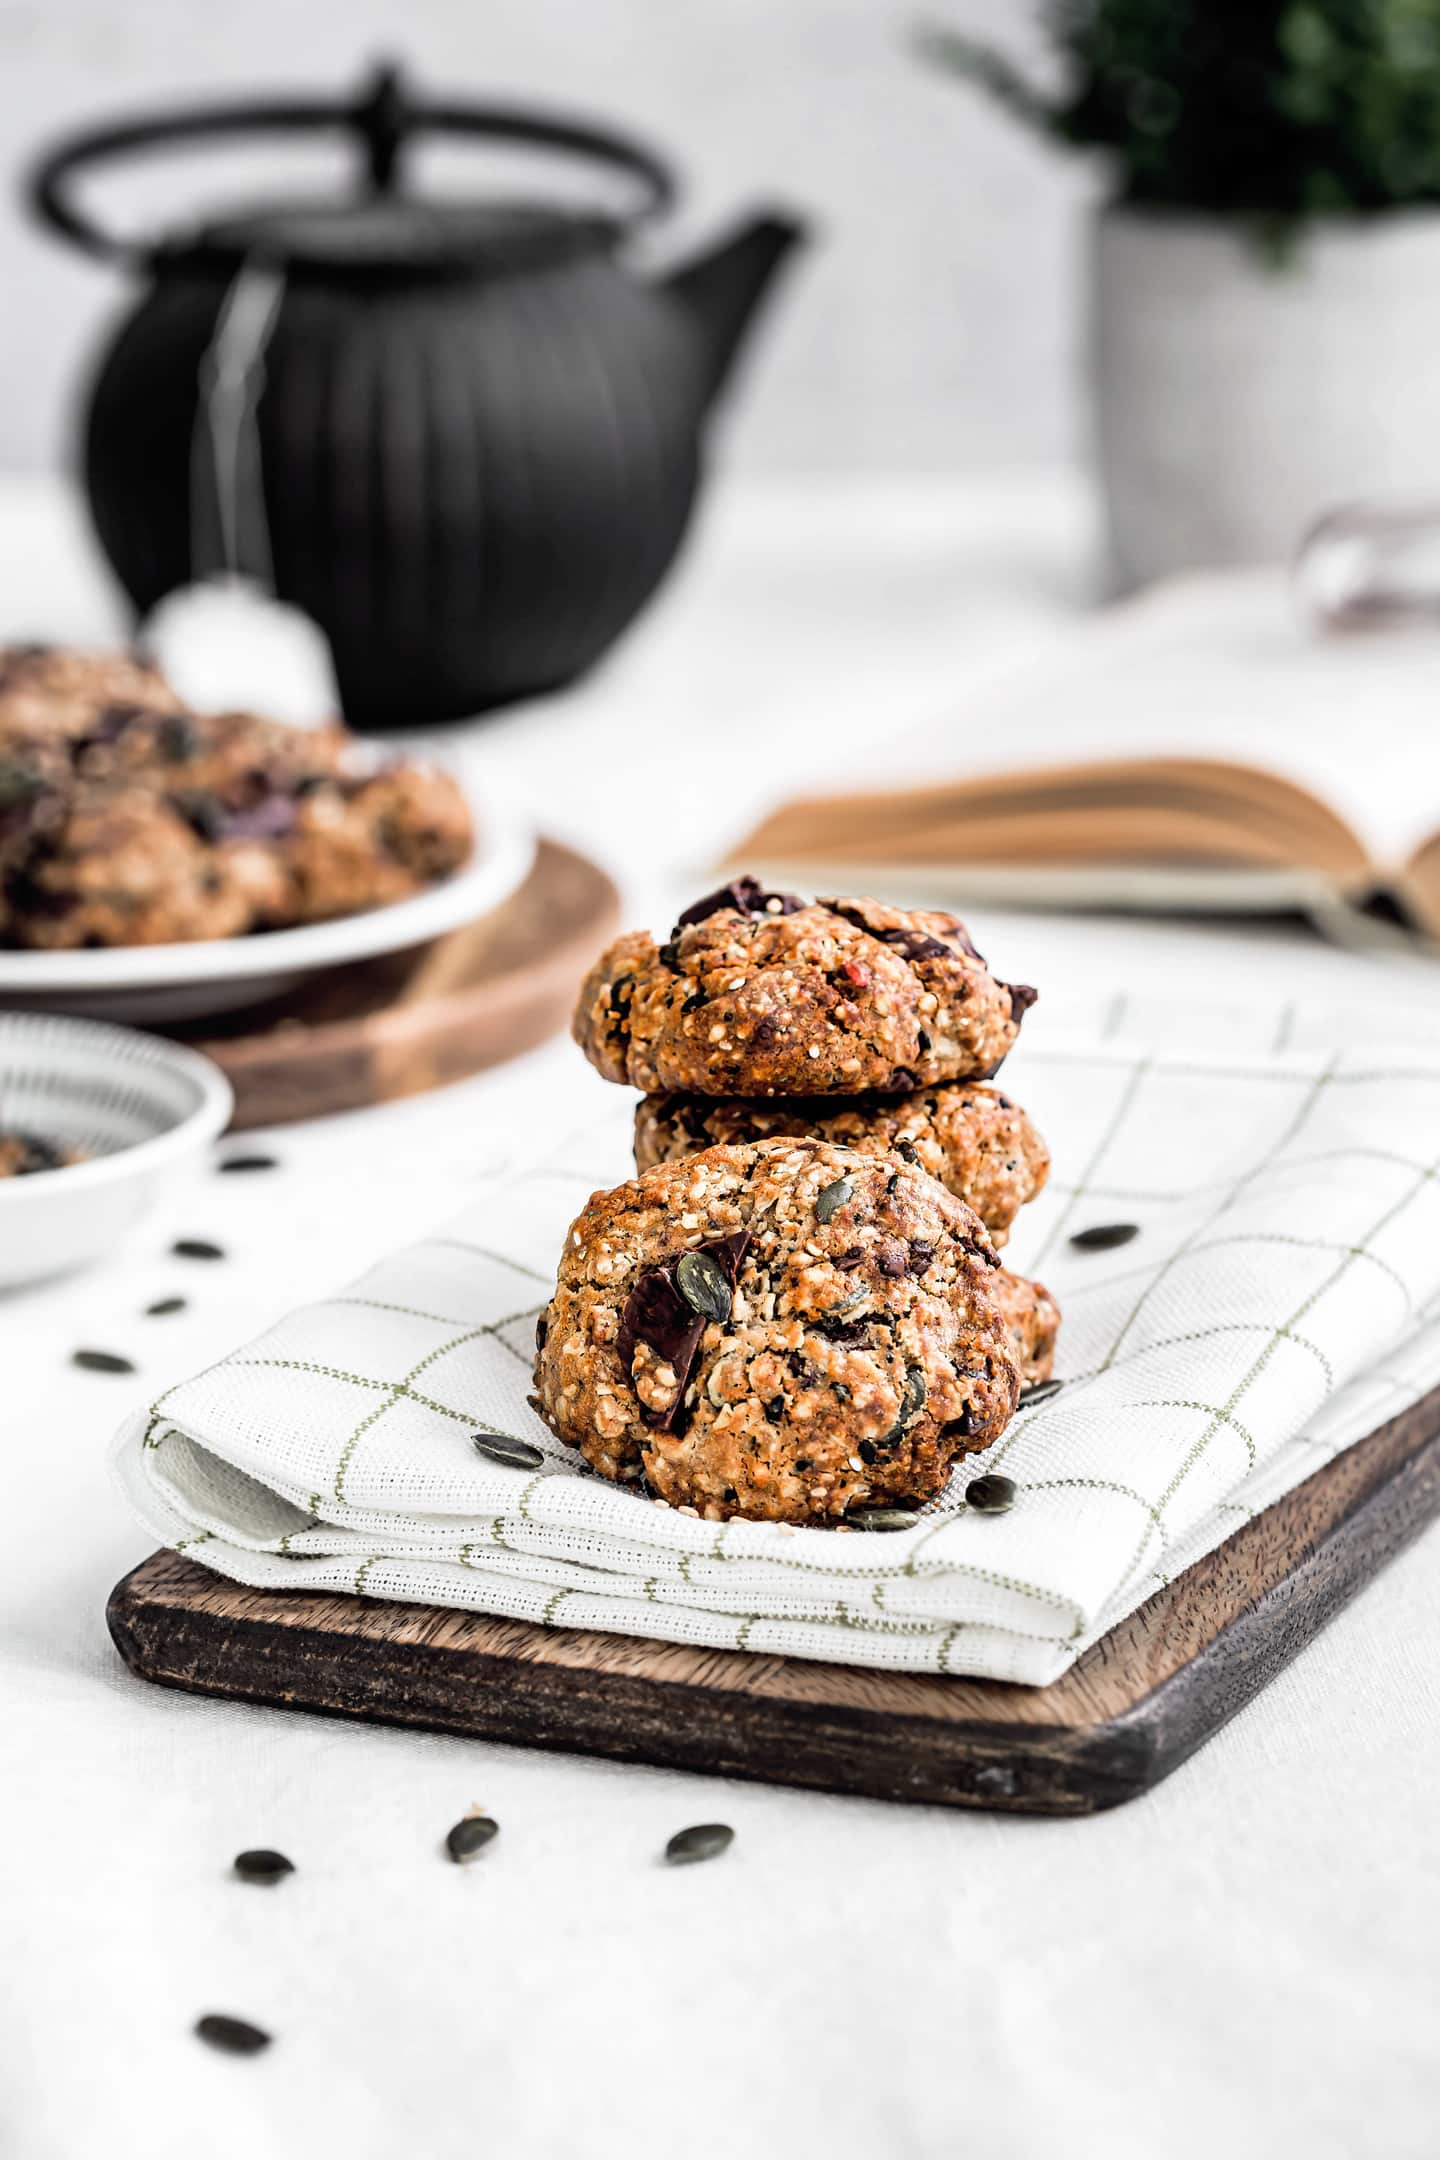 Multigrain cookies and chocolate